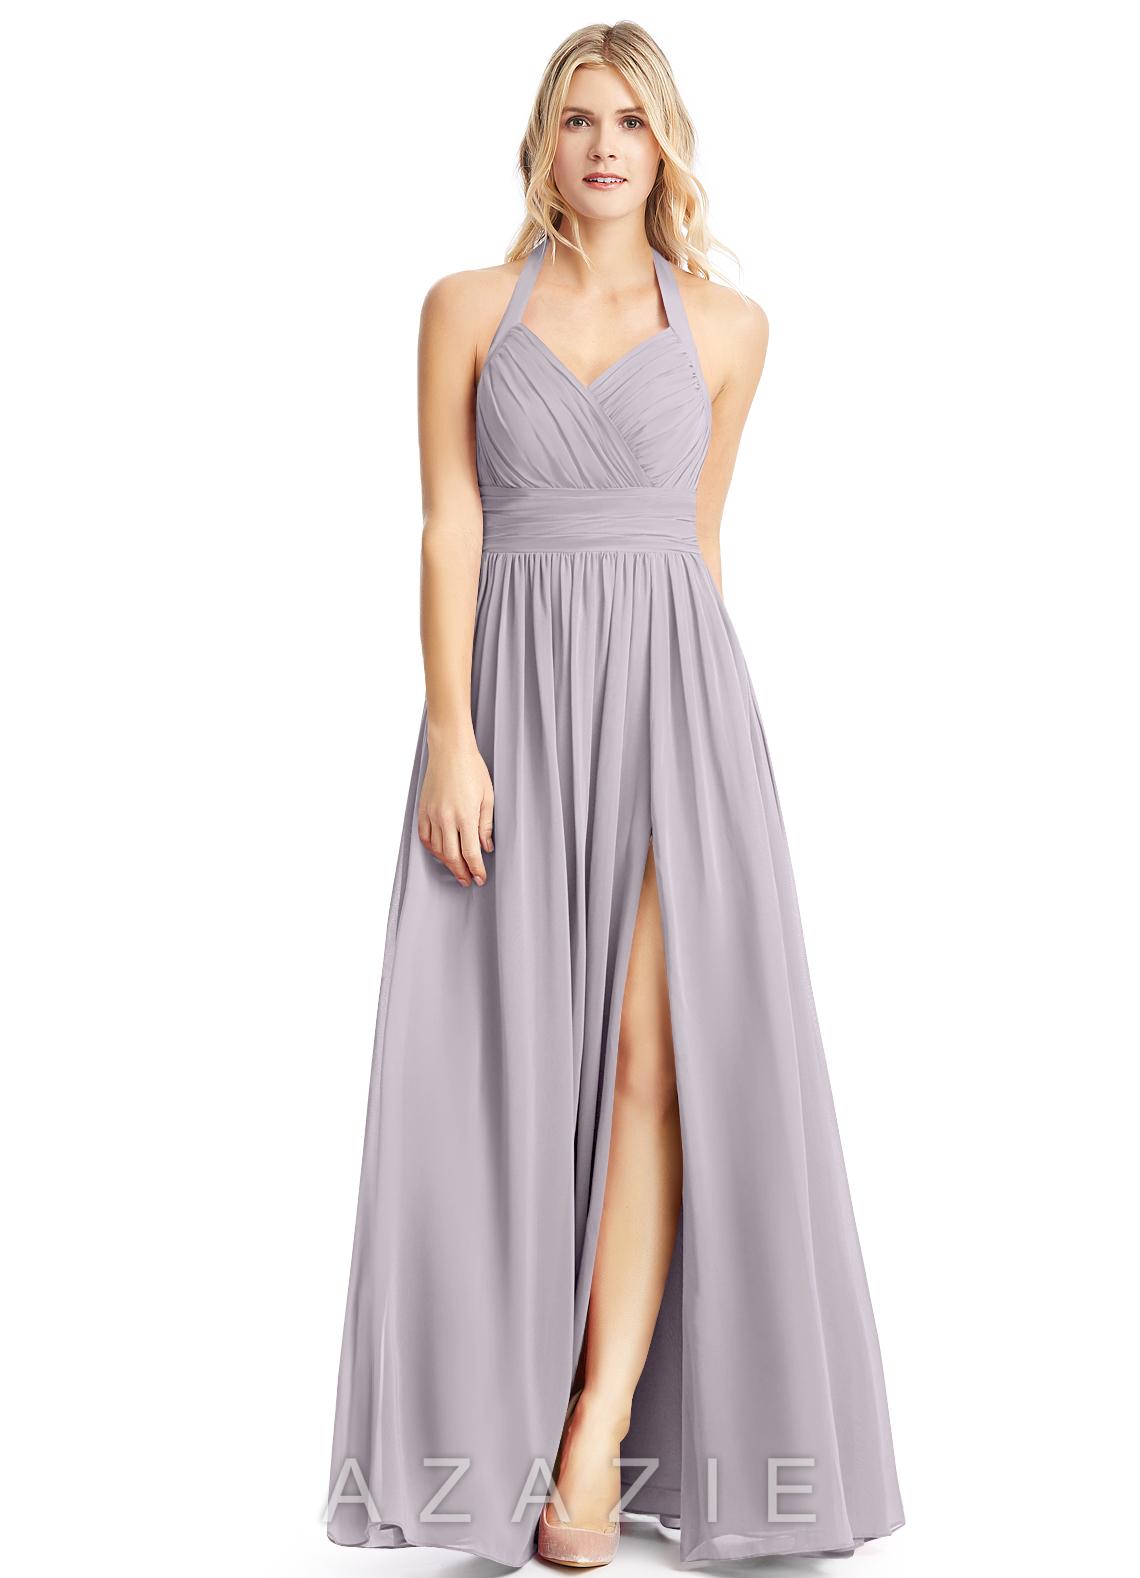 Azazie Veronica Bridesmaid Dress | Azazie - photo #36